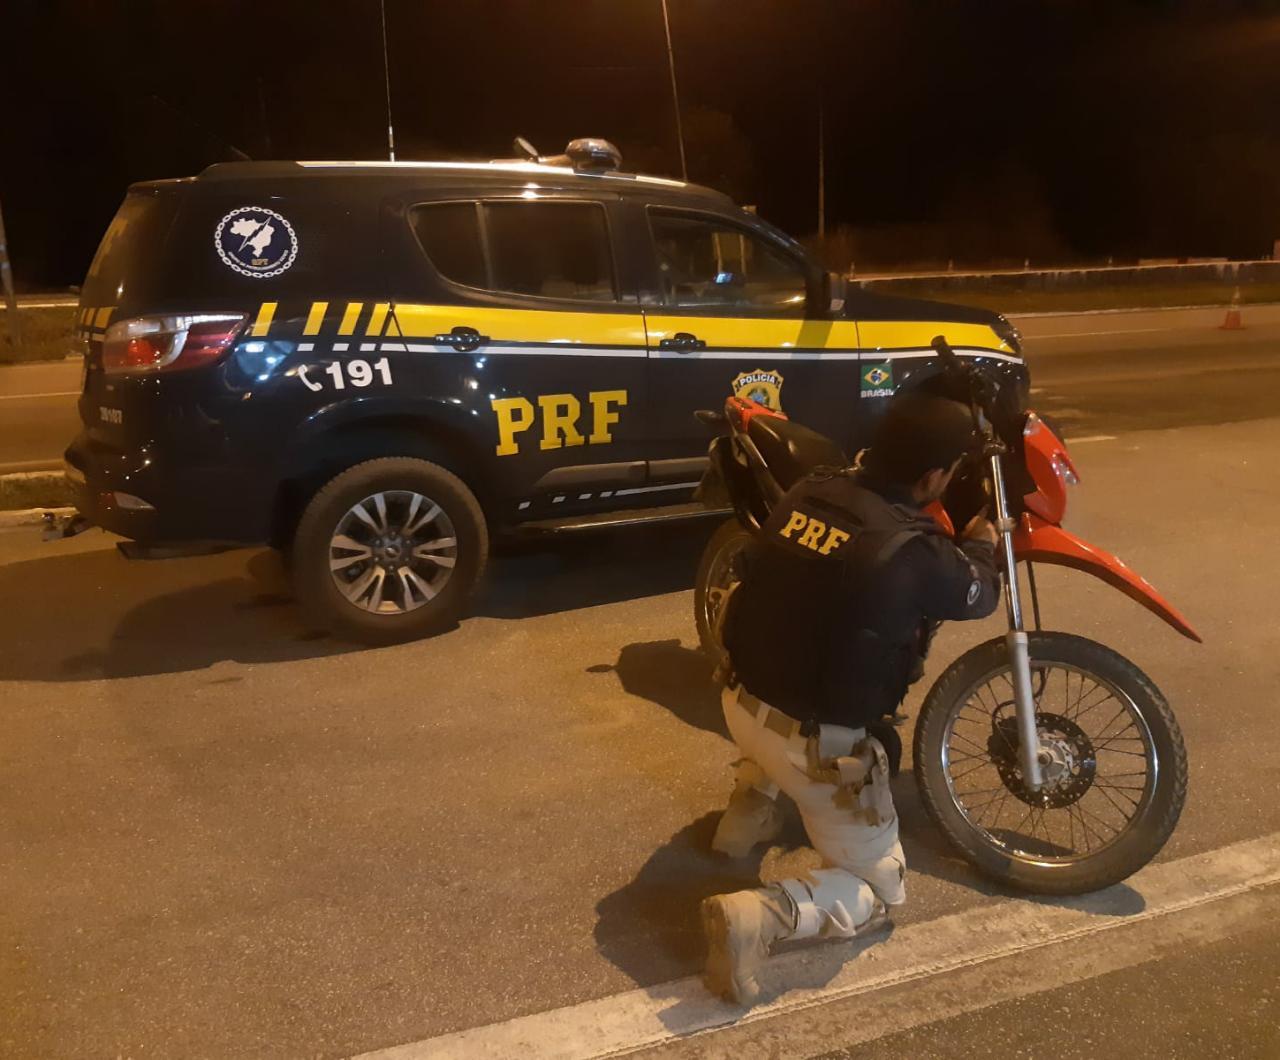 WhatsApp Image 2020 10 16 at 12.39.55 - PRF na Paraíba recupera motocicleta roubada e adulterada em Mamanguape